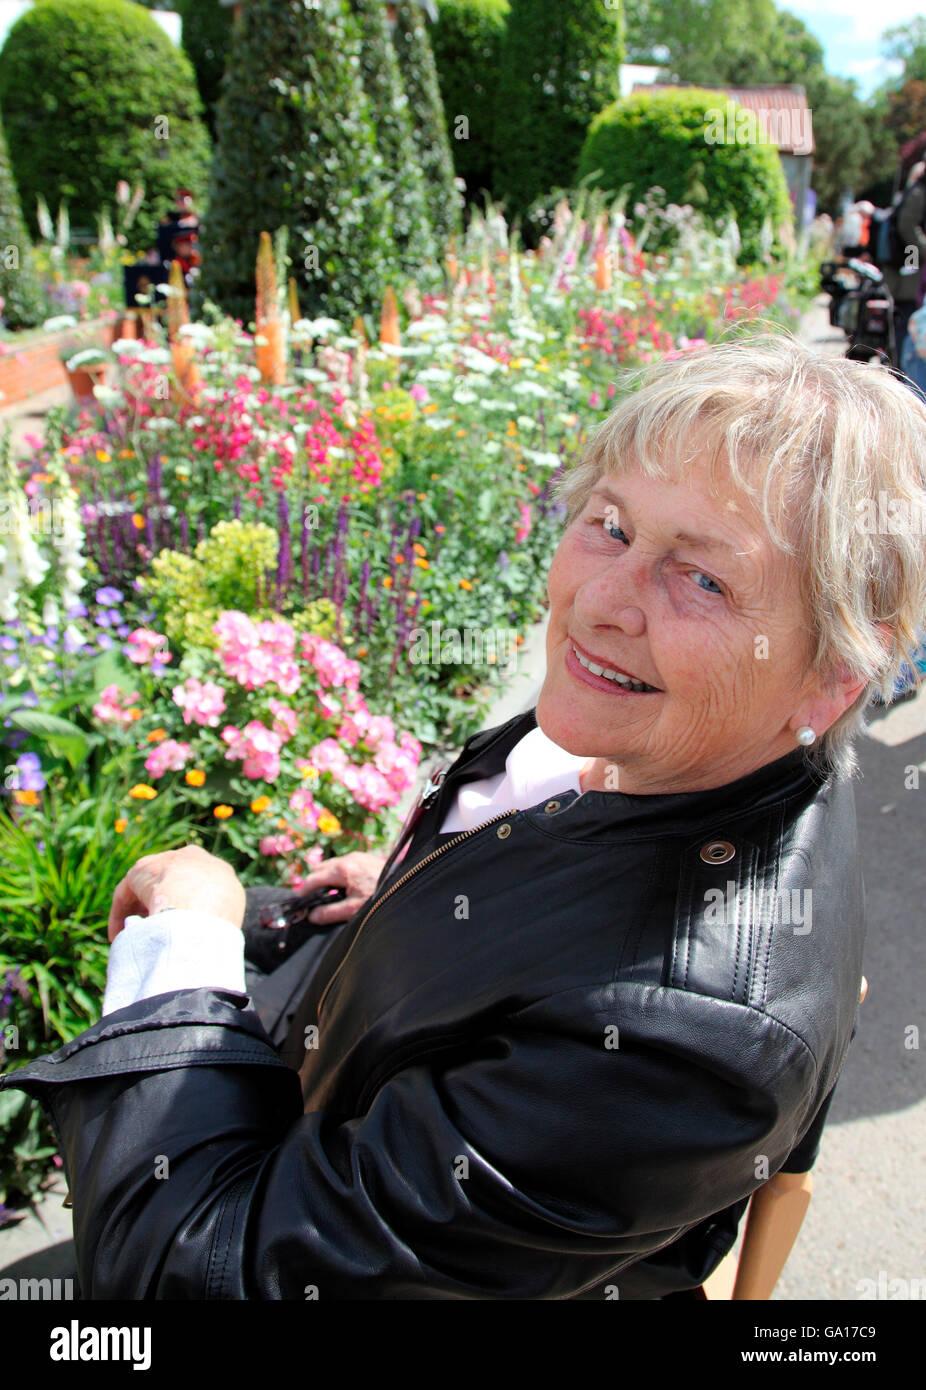 Helen Dillon, Irish garden guru at RHS Chelsea Flower Show 2016 - Stock Image